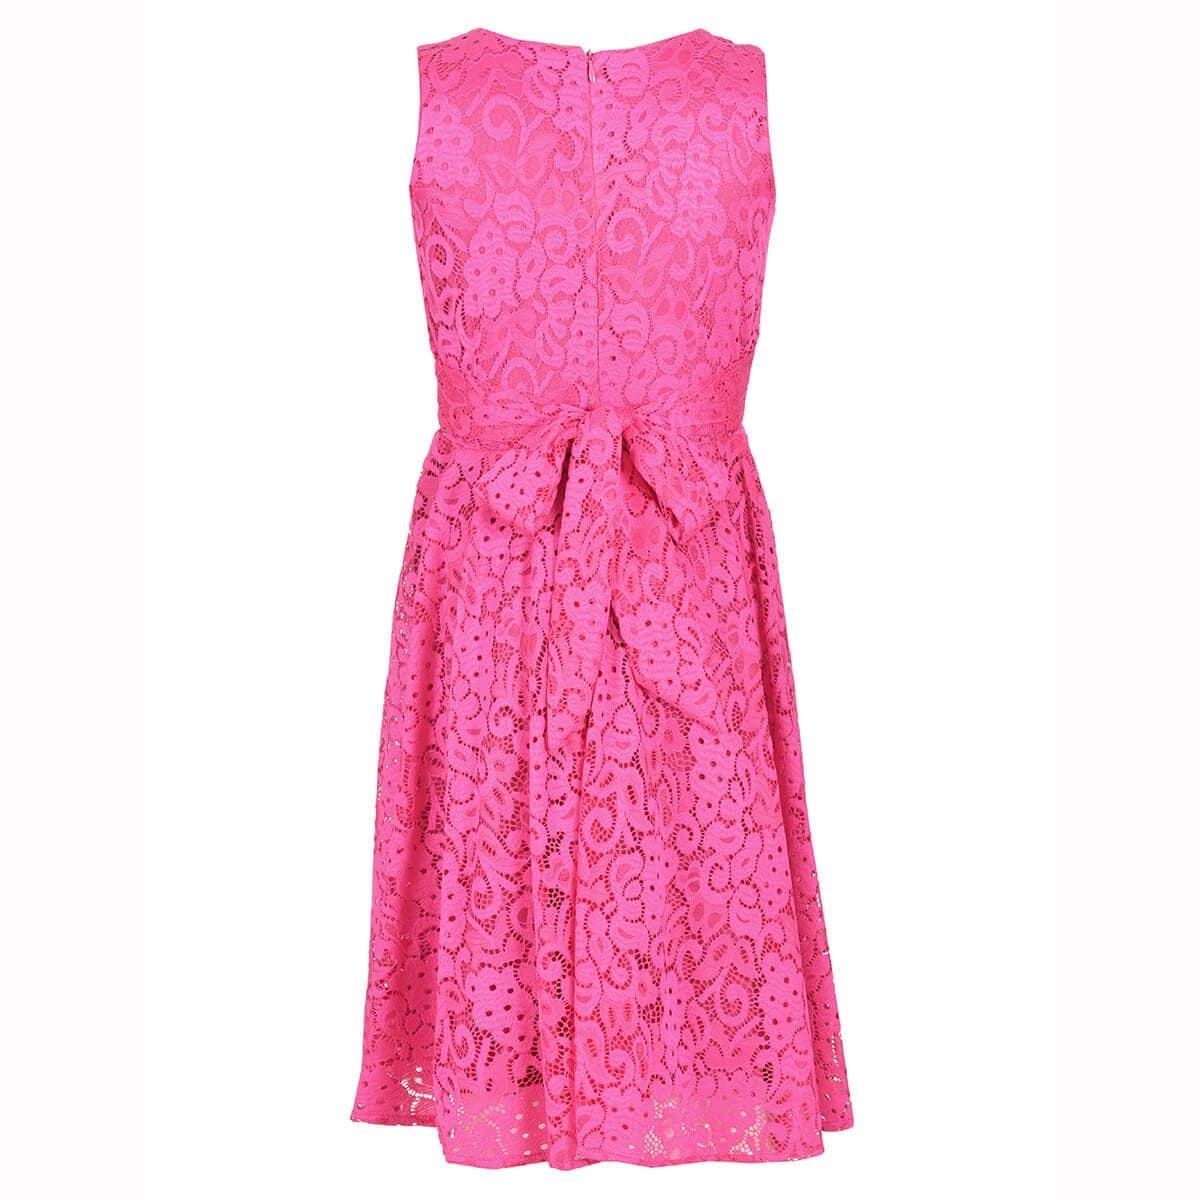 Vestido Color Rosa Philosophy Girls